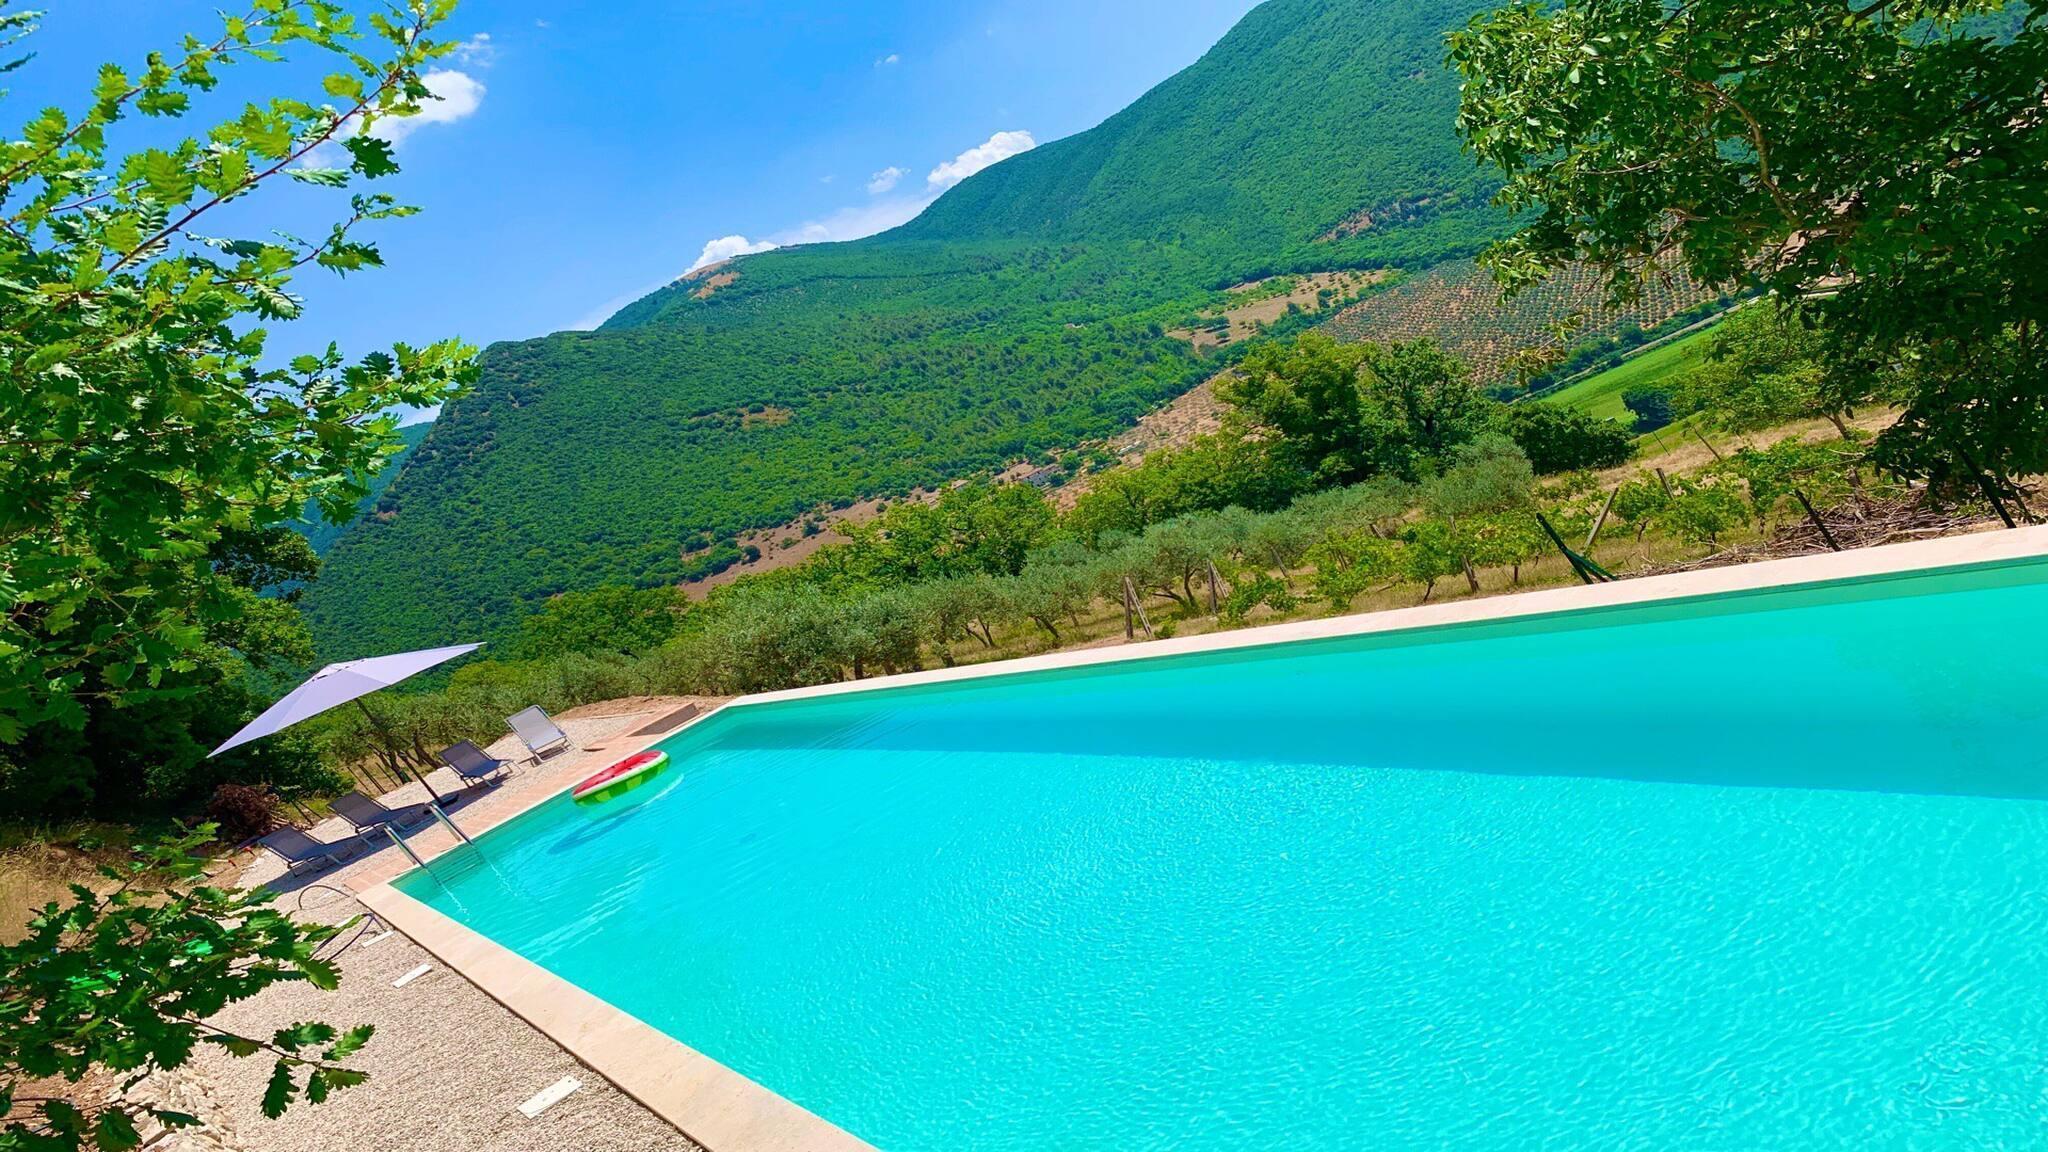 Luxury Luxury Luxury Silvignano Pool-side Villa Spoleto 8 km Rome 1 Hr